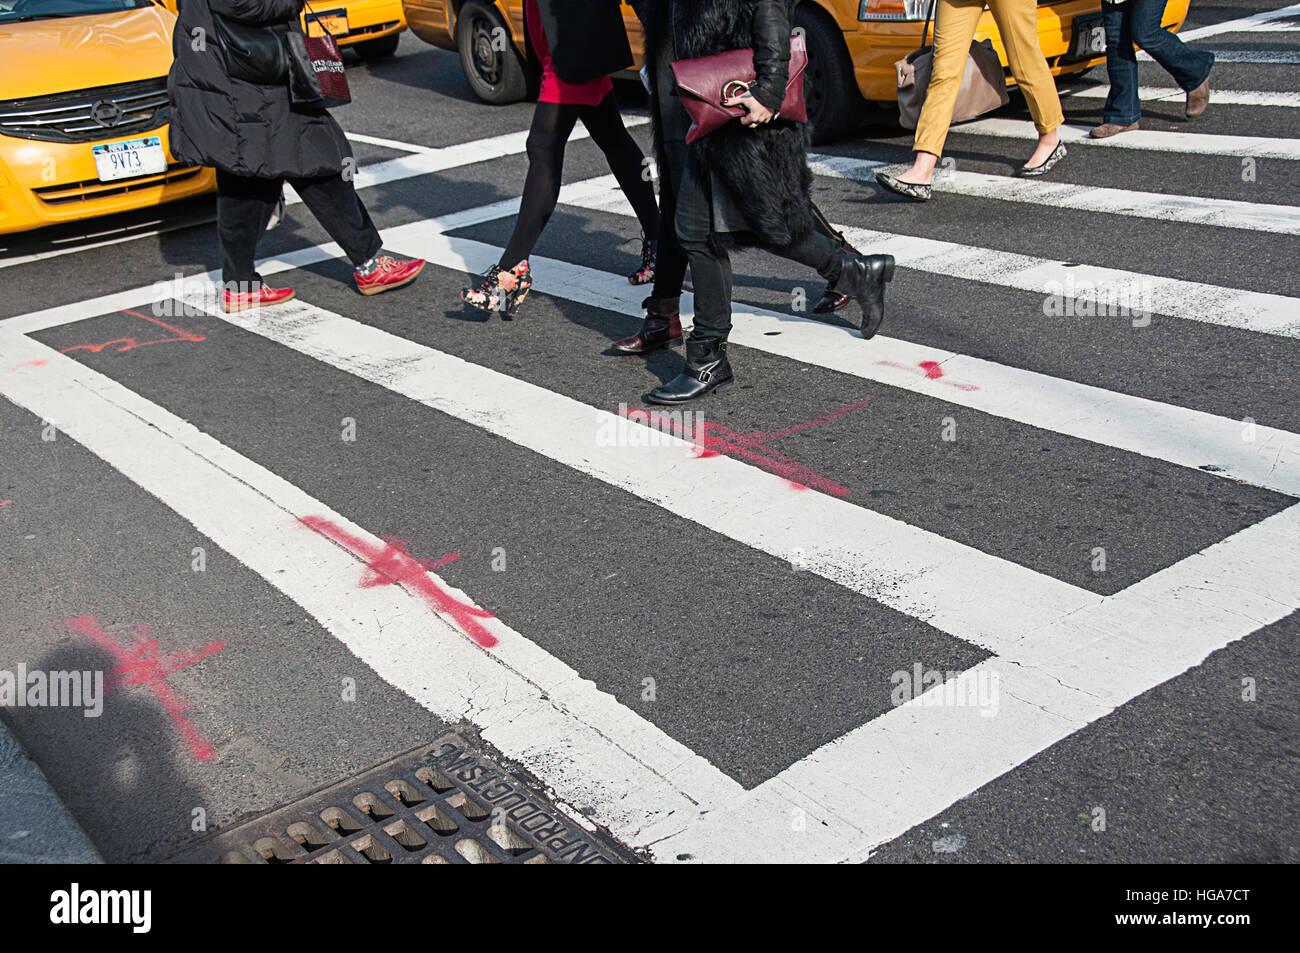 People crossing a crosswalk in New York city. - Stock Image